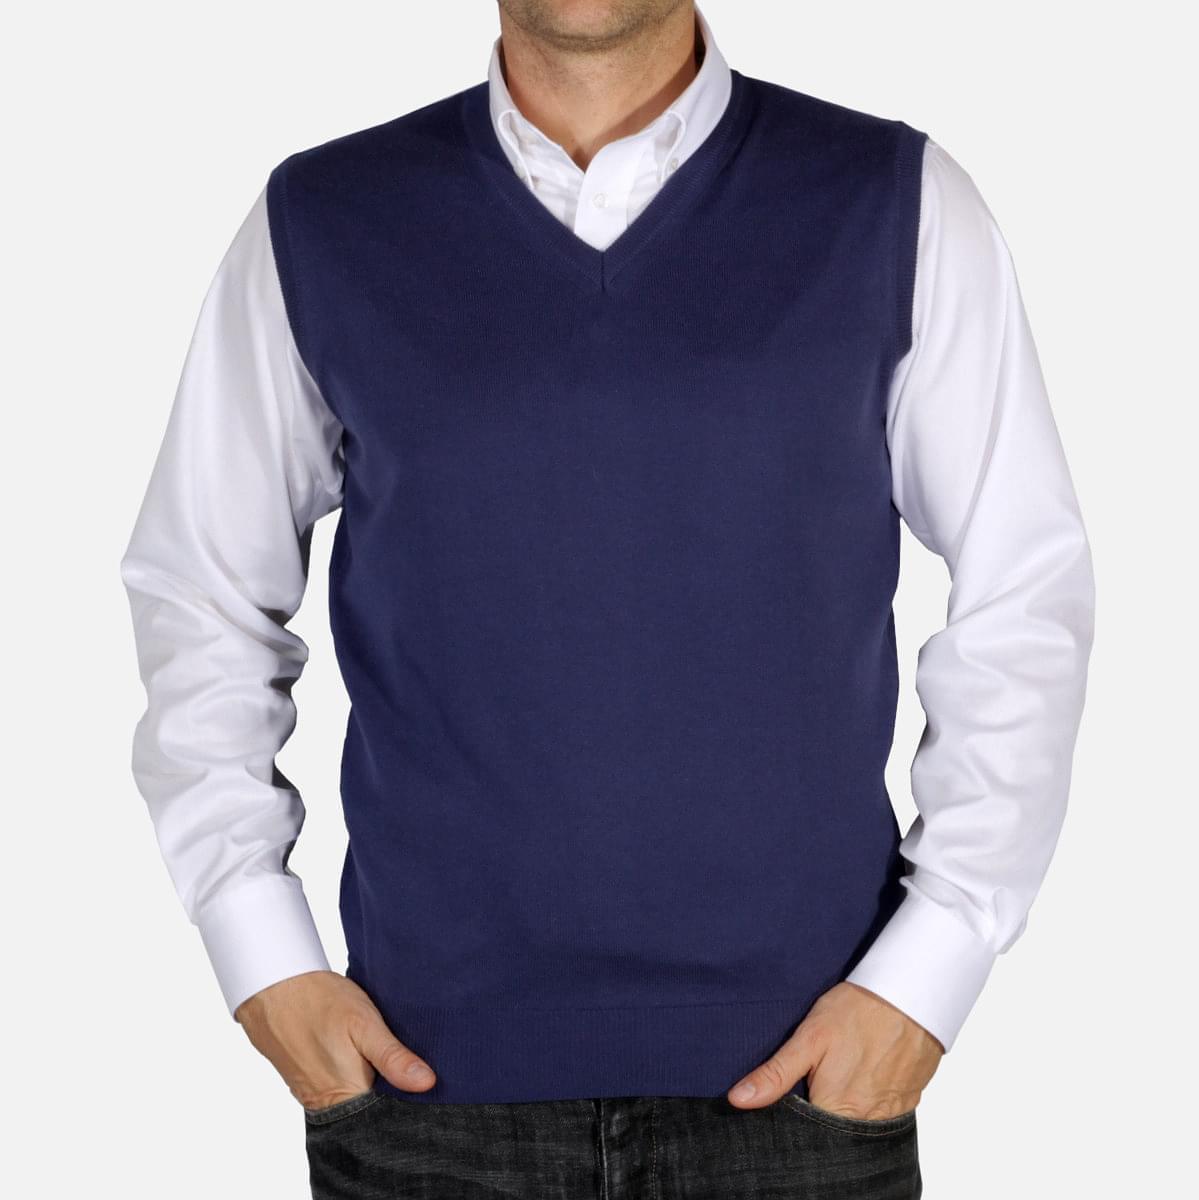 Pánská pletená vesta Willsoor 5031 v modré barvě M